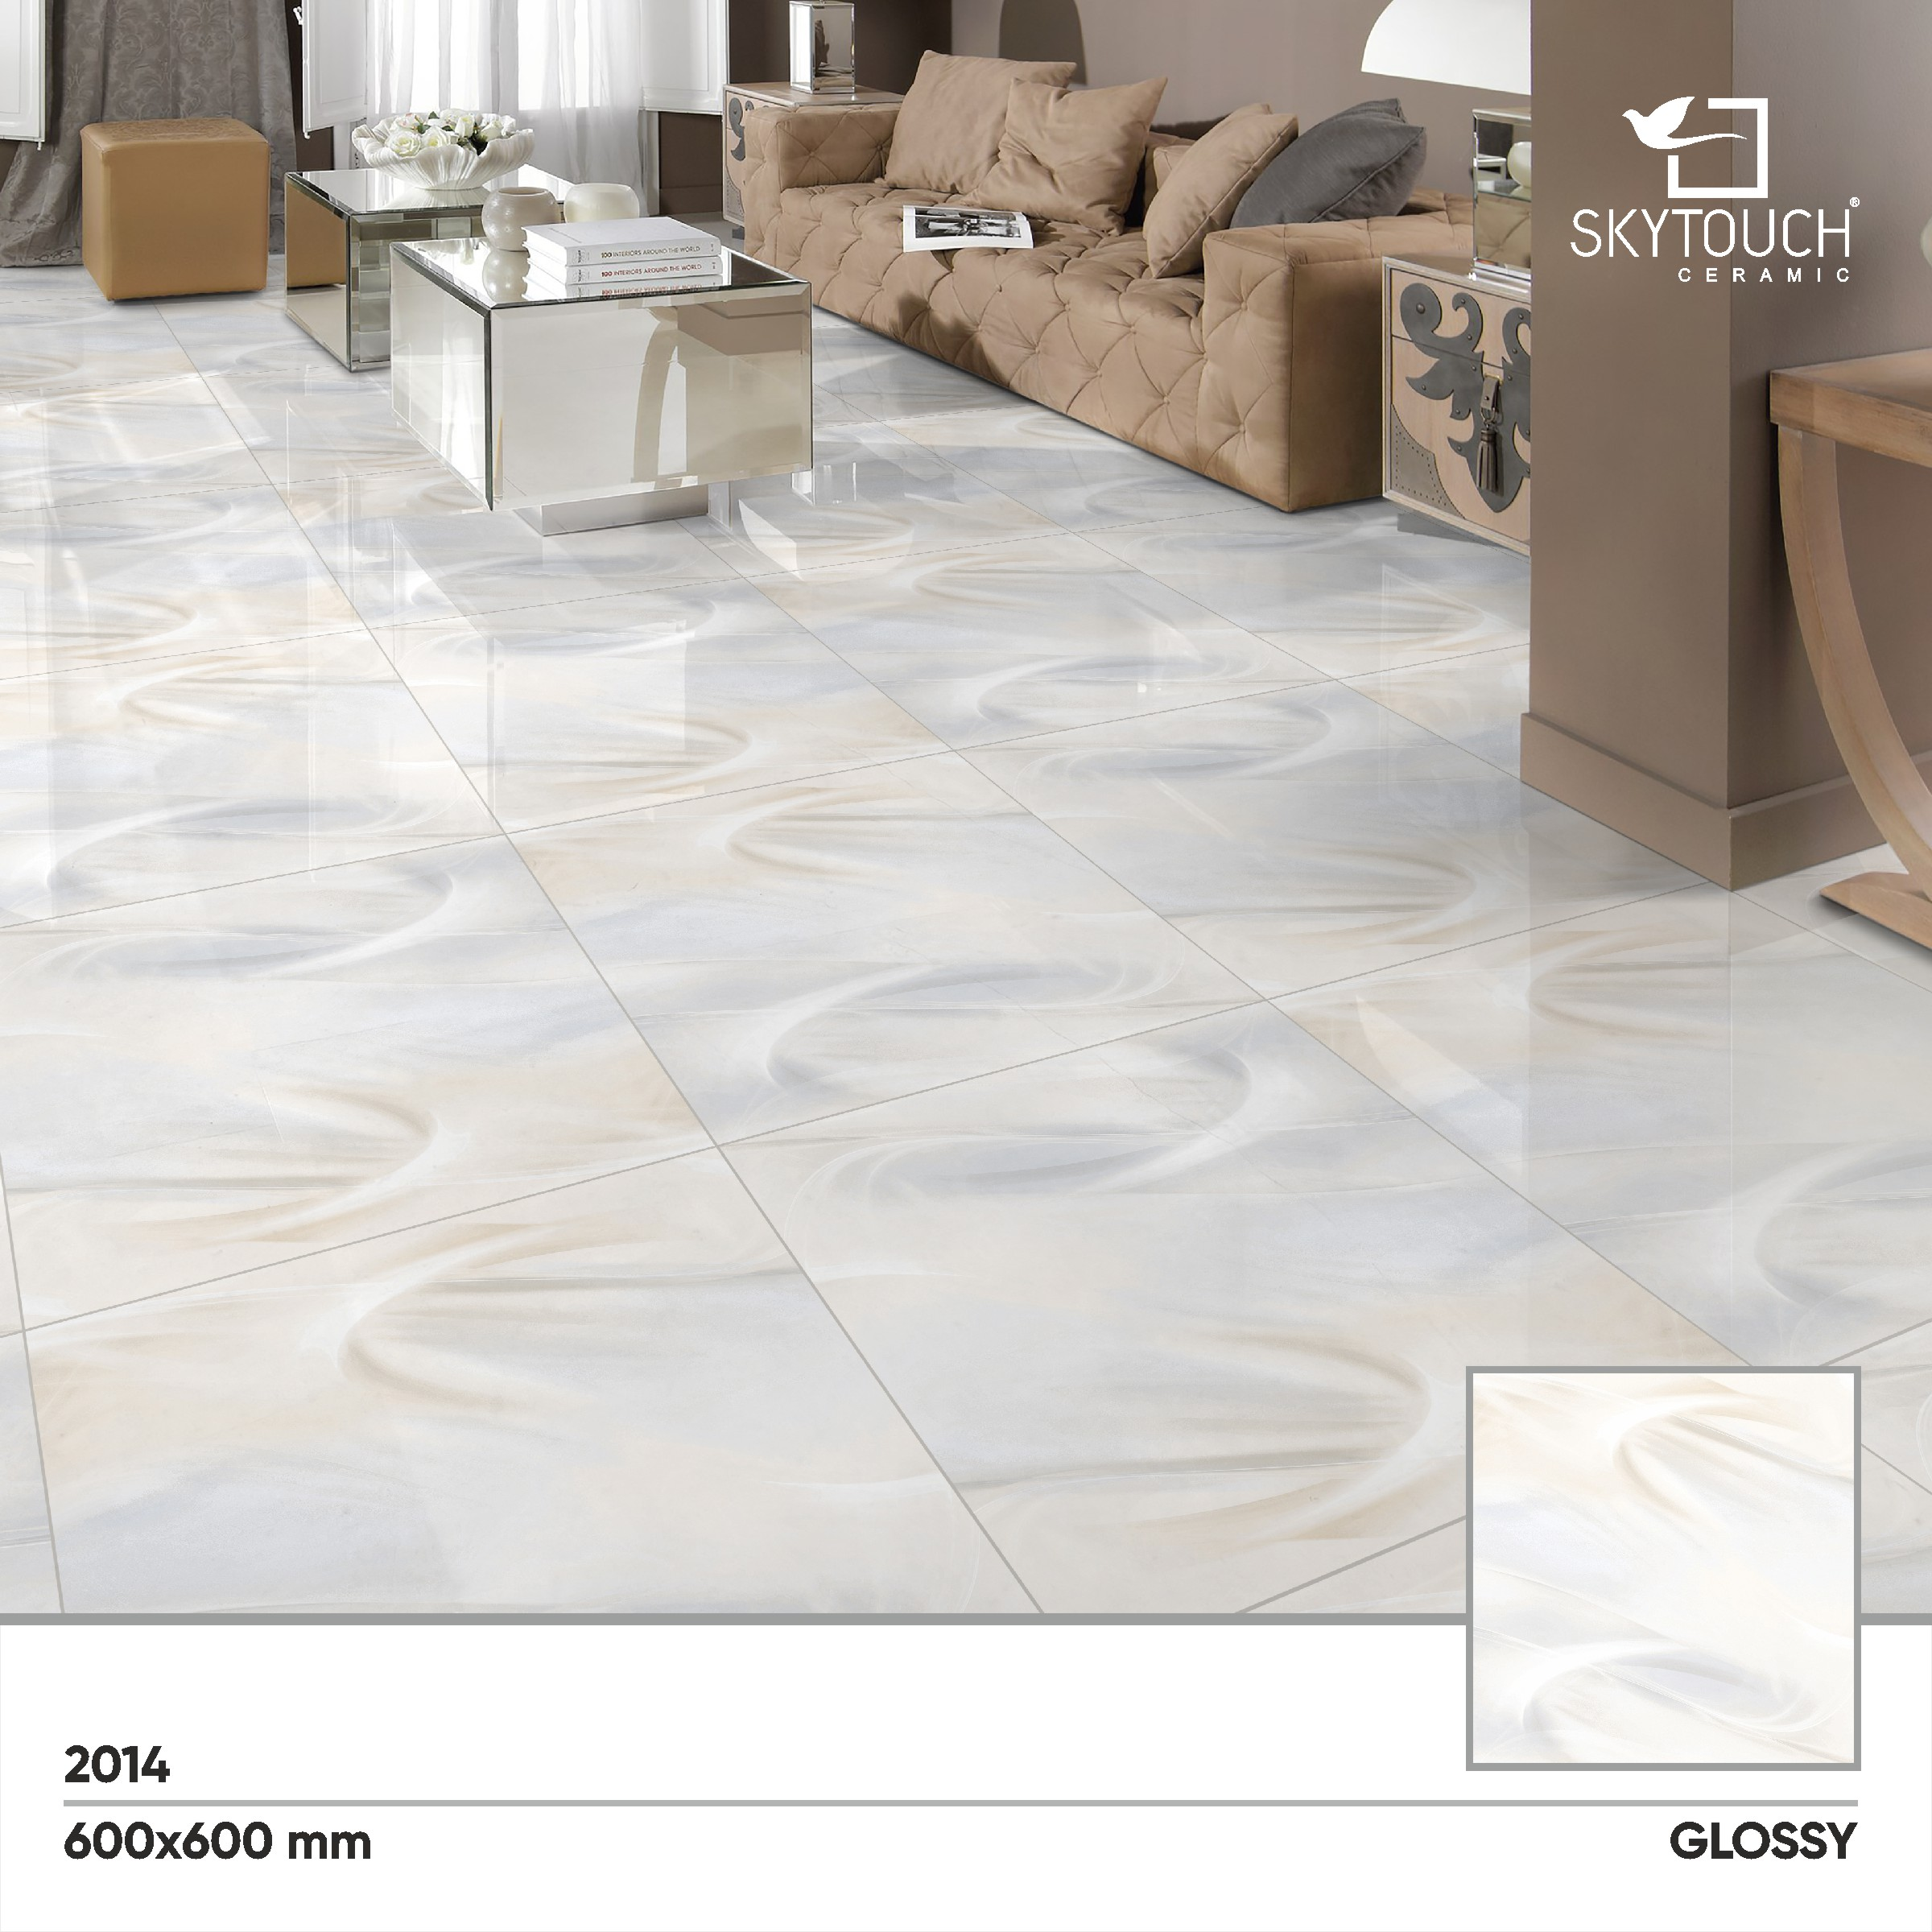 8 5mm thickness porcelain tiles deck anti slip outdoor porcelanato 60x60 quartz tile lowes ceramic flooring buy 600 x1200mm indian living room